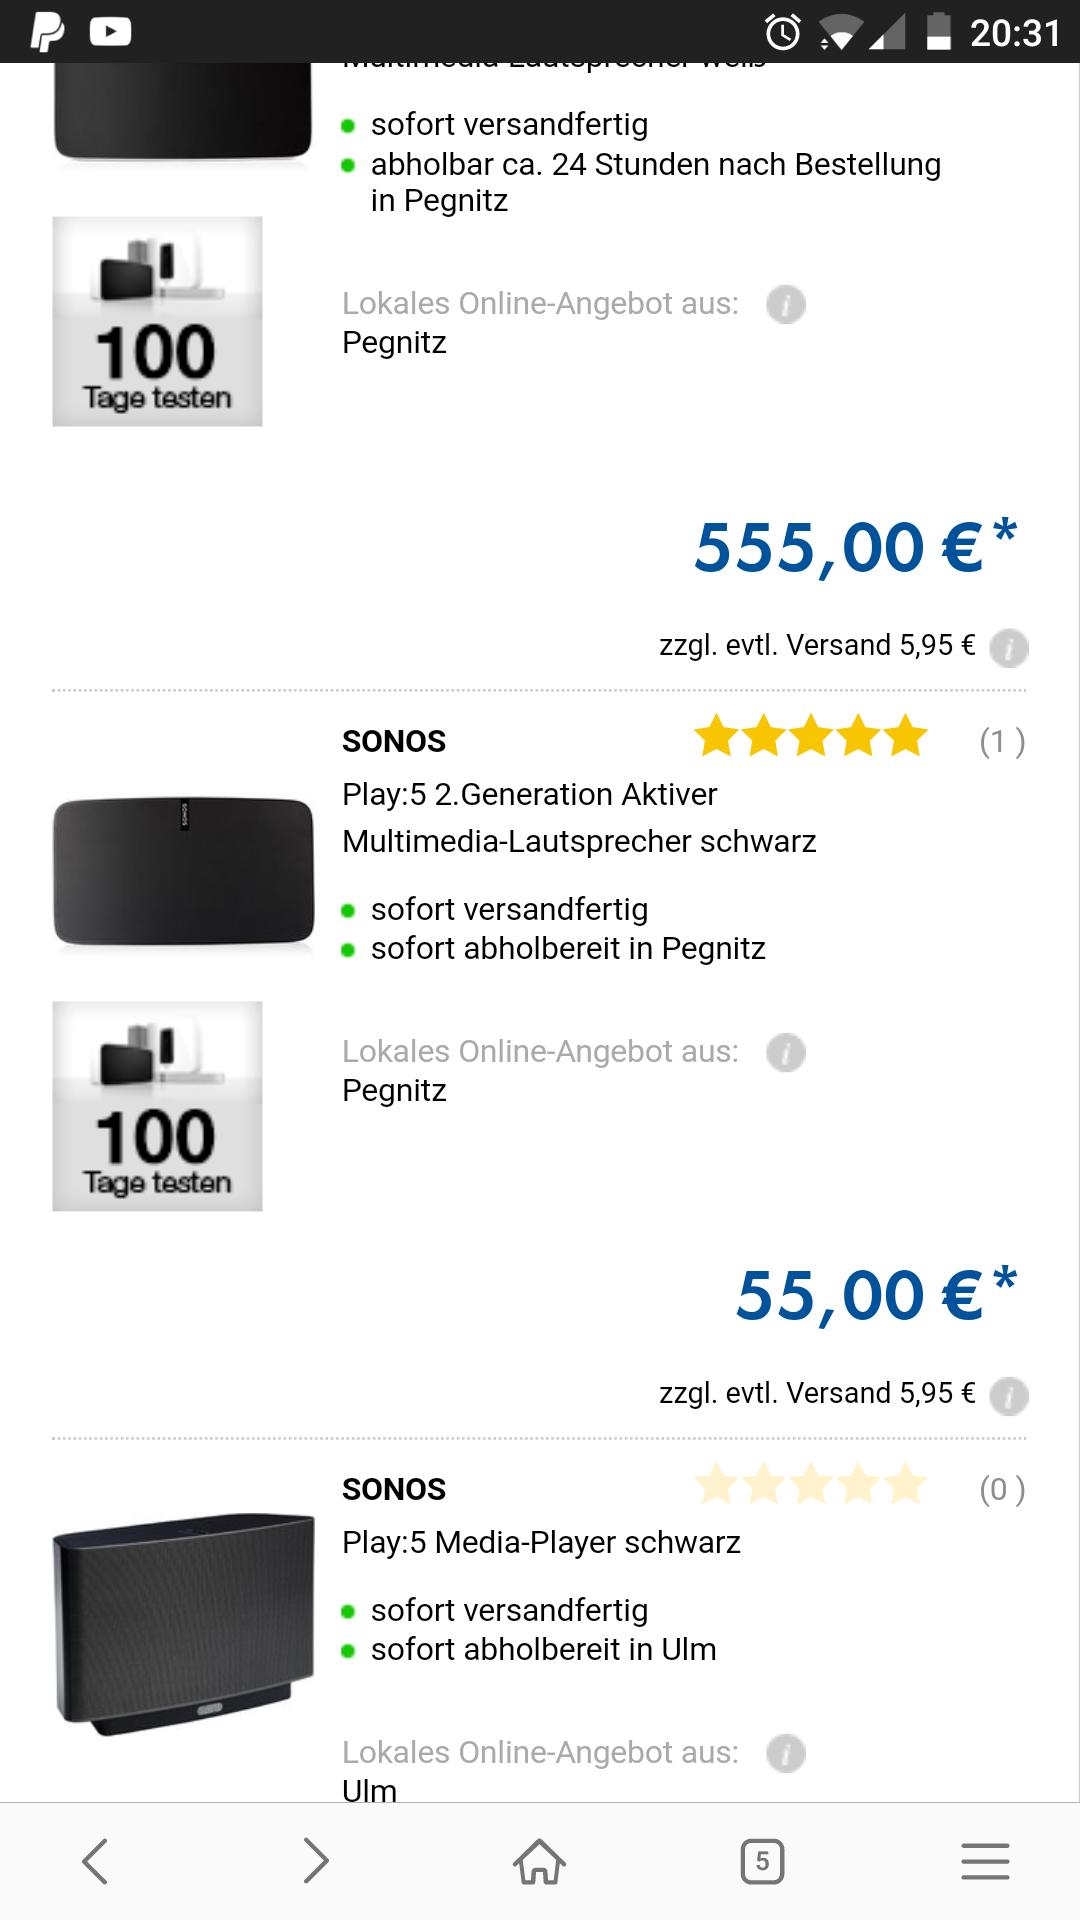 Sonos Play 5 für 55€ Preisfehler?